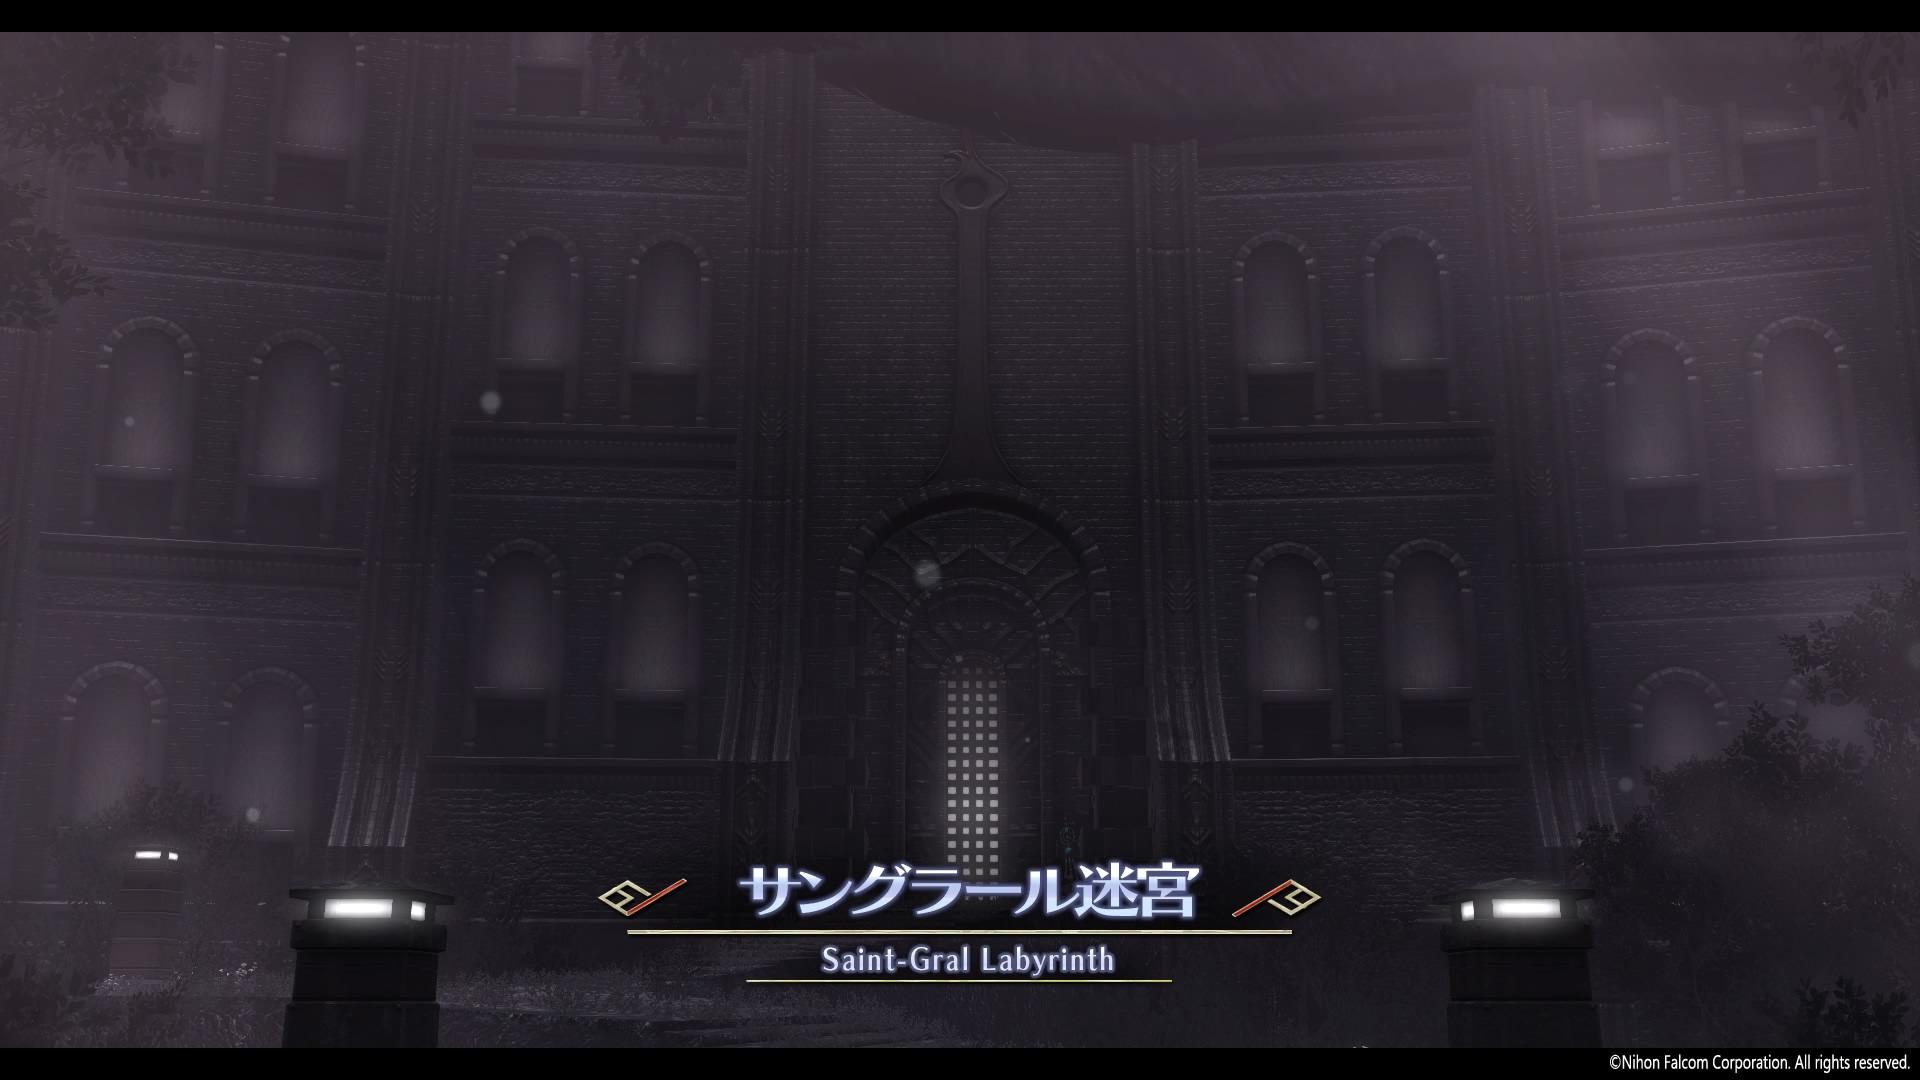 Saint-Gral Labyrinth